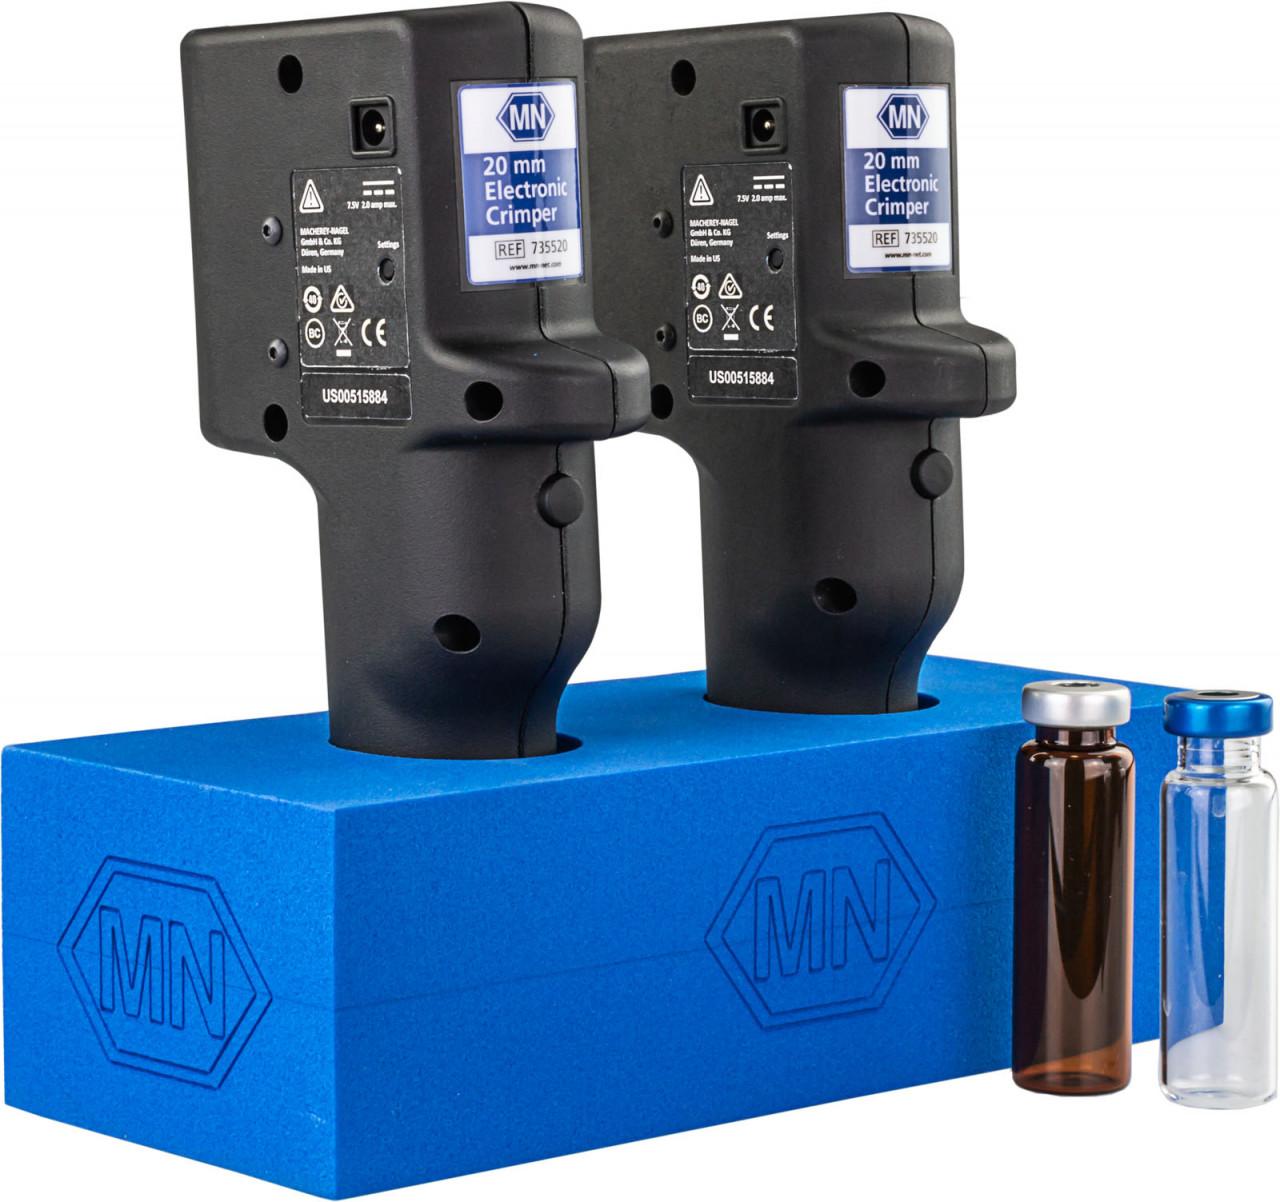 electronic-crimping-tools-vials-735509-735520